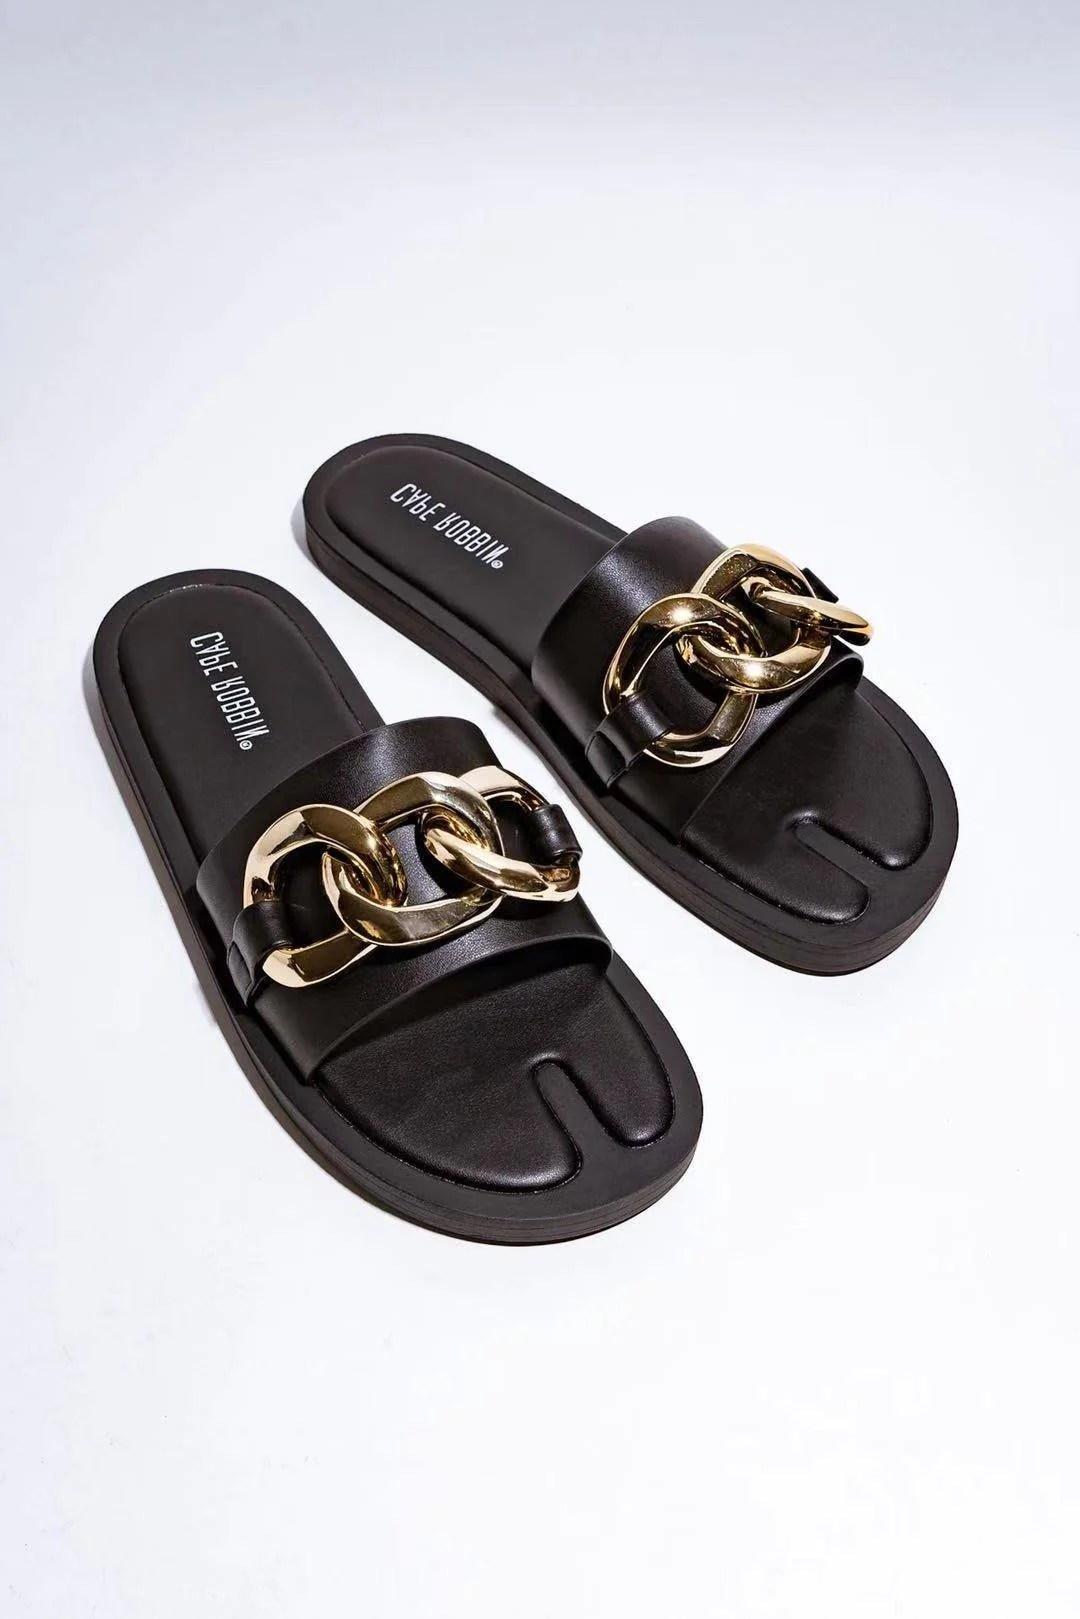 Gucci Slides Size Chart : gucci, slides, chart, FLASHYBOX, CHAIN, HEART, SANDAL-BLACK, Women's, Shoes